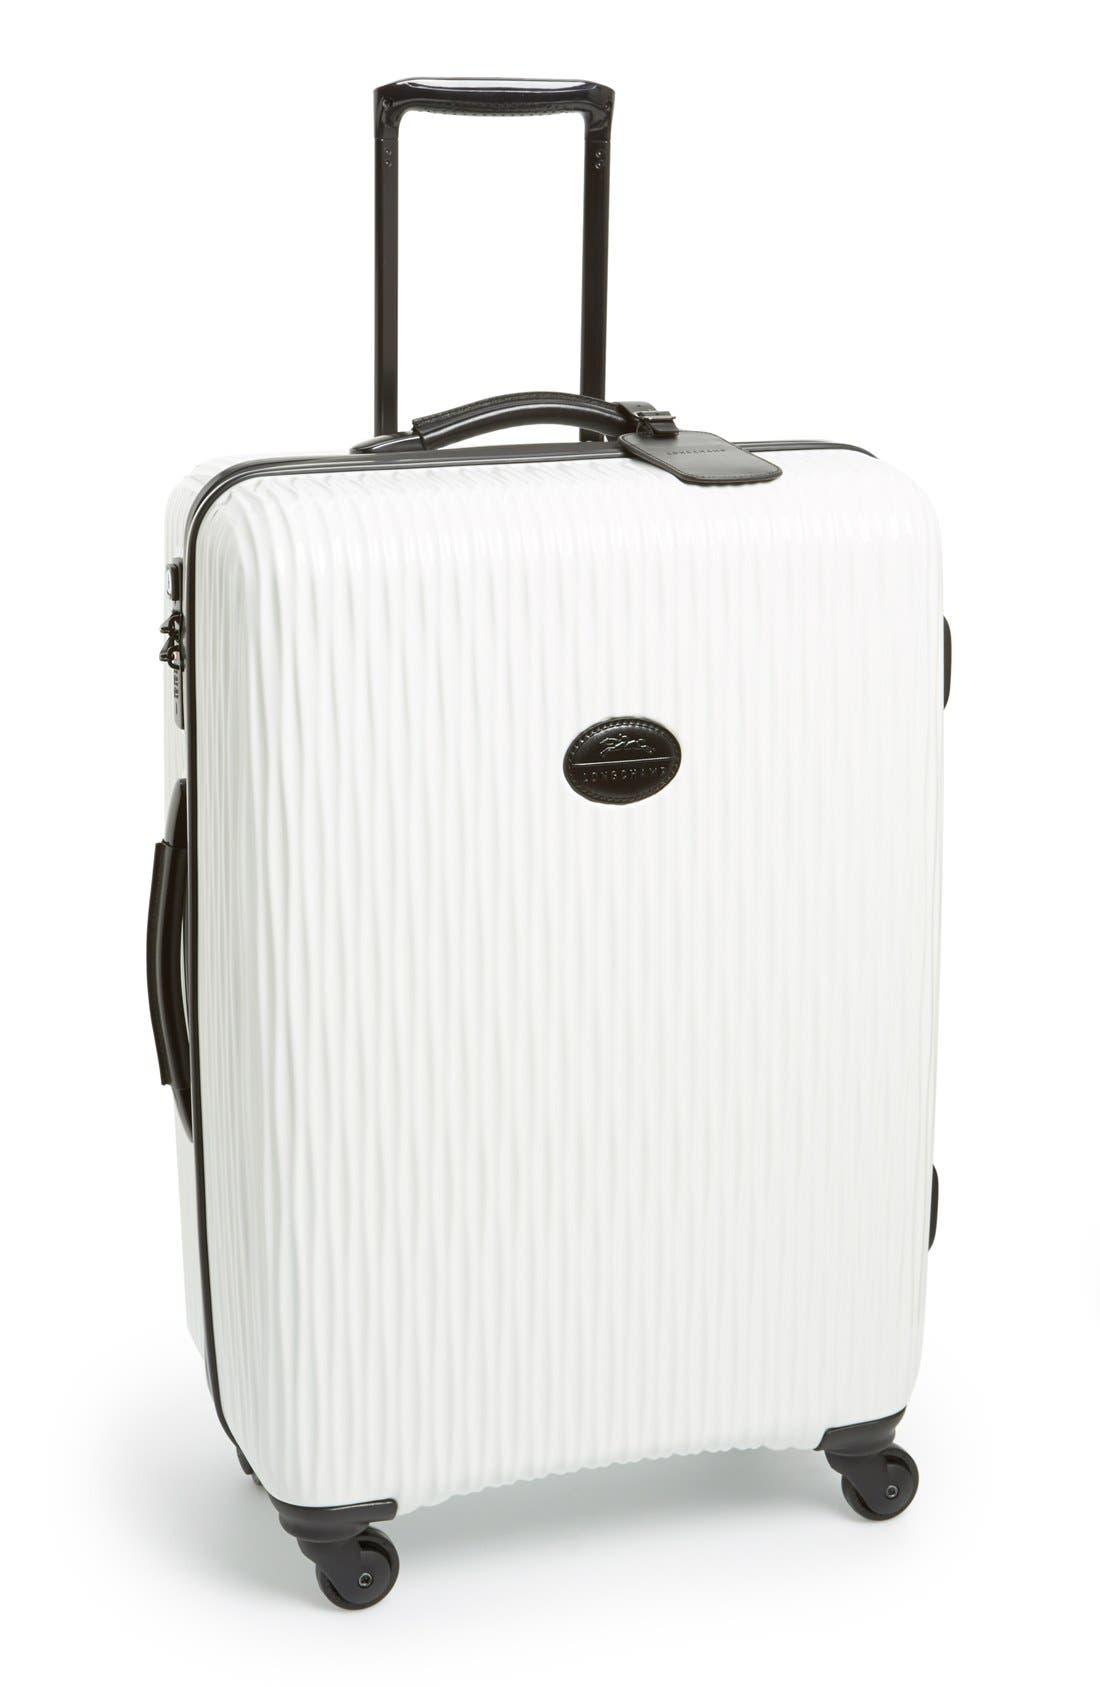 Alternate Image 1 Selected - Longchamp 'Medium Fairval' Four-Wheel Hard Shell Suitcase (28 Inch)